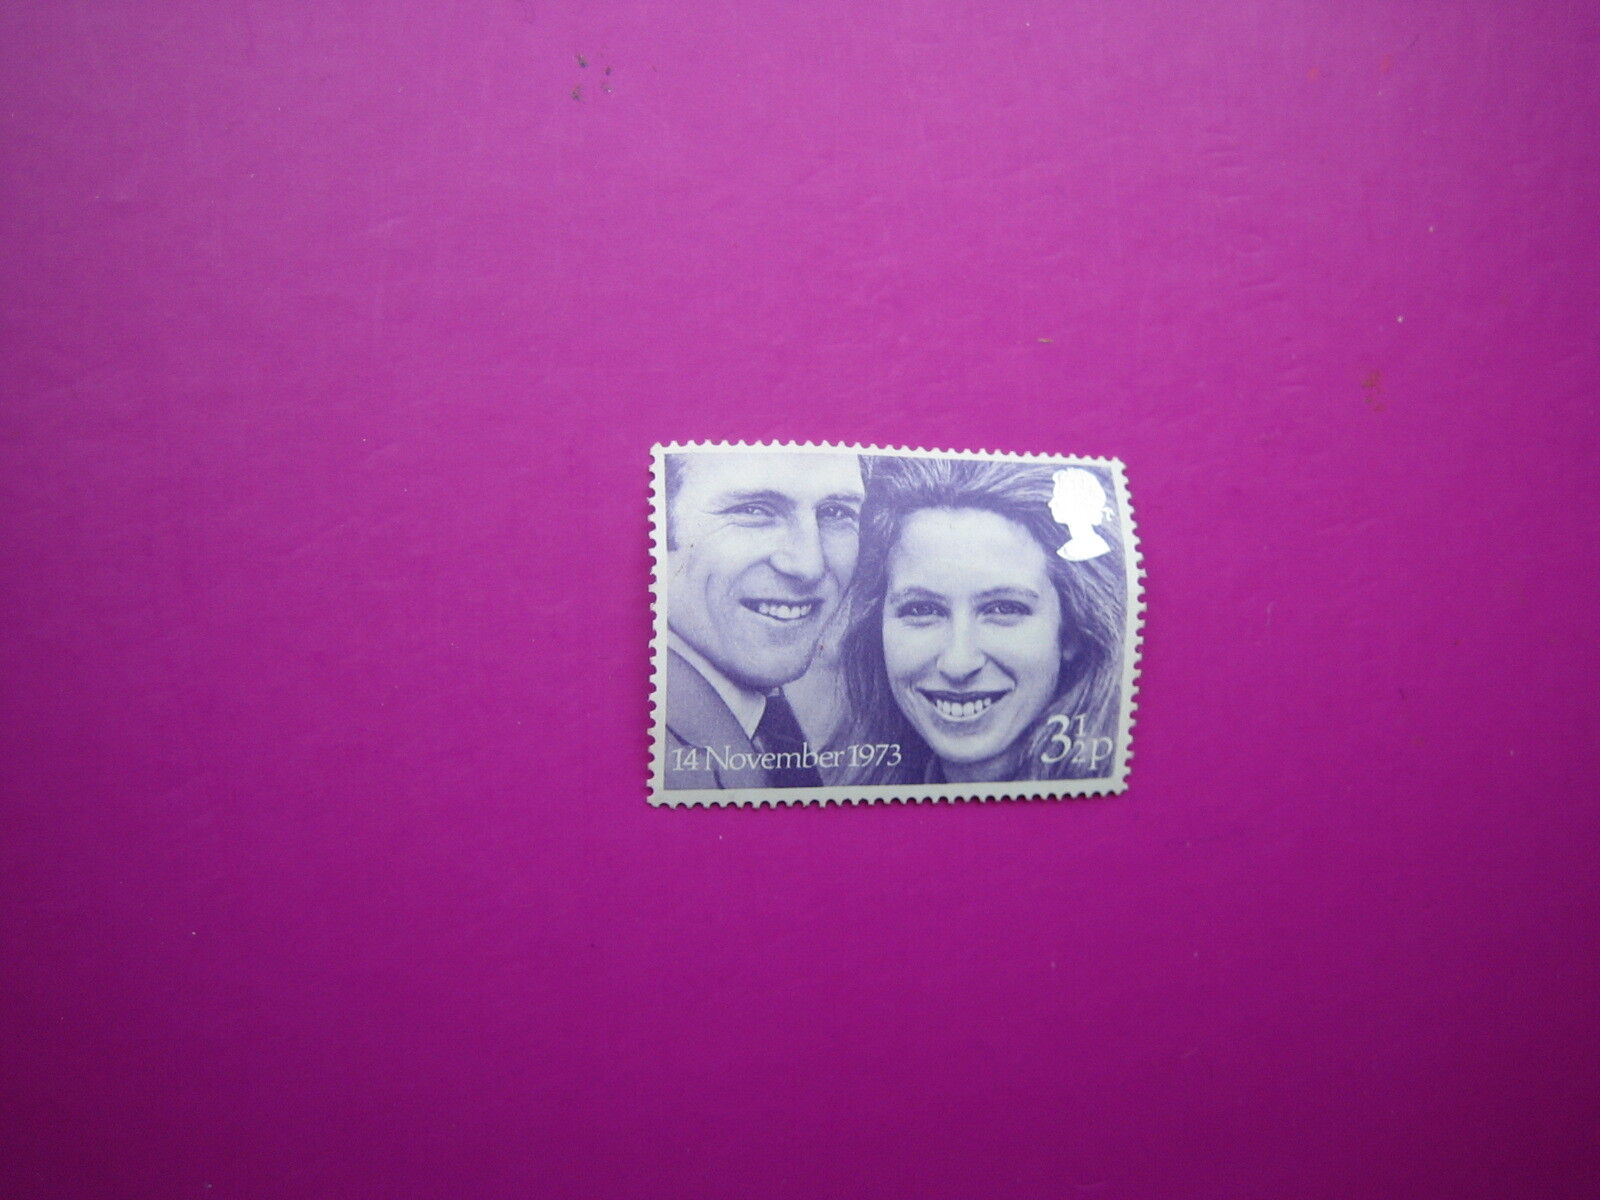 Princess Anne and Mark Phillips 3p Stamp {14 Nov 1973} Royal Wedding FREEPOST